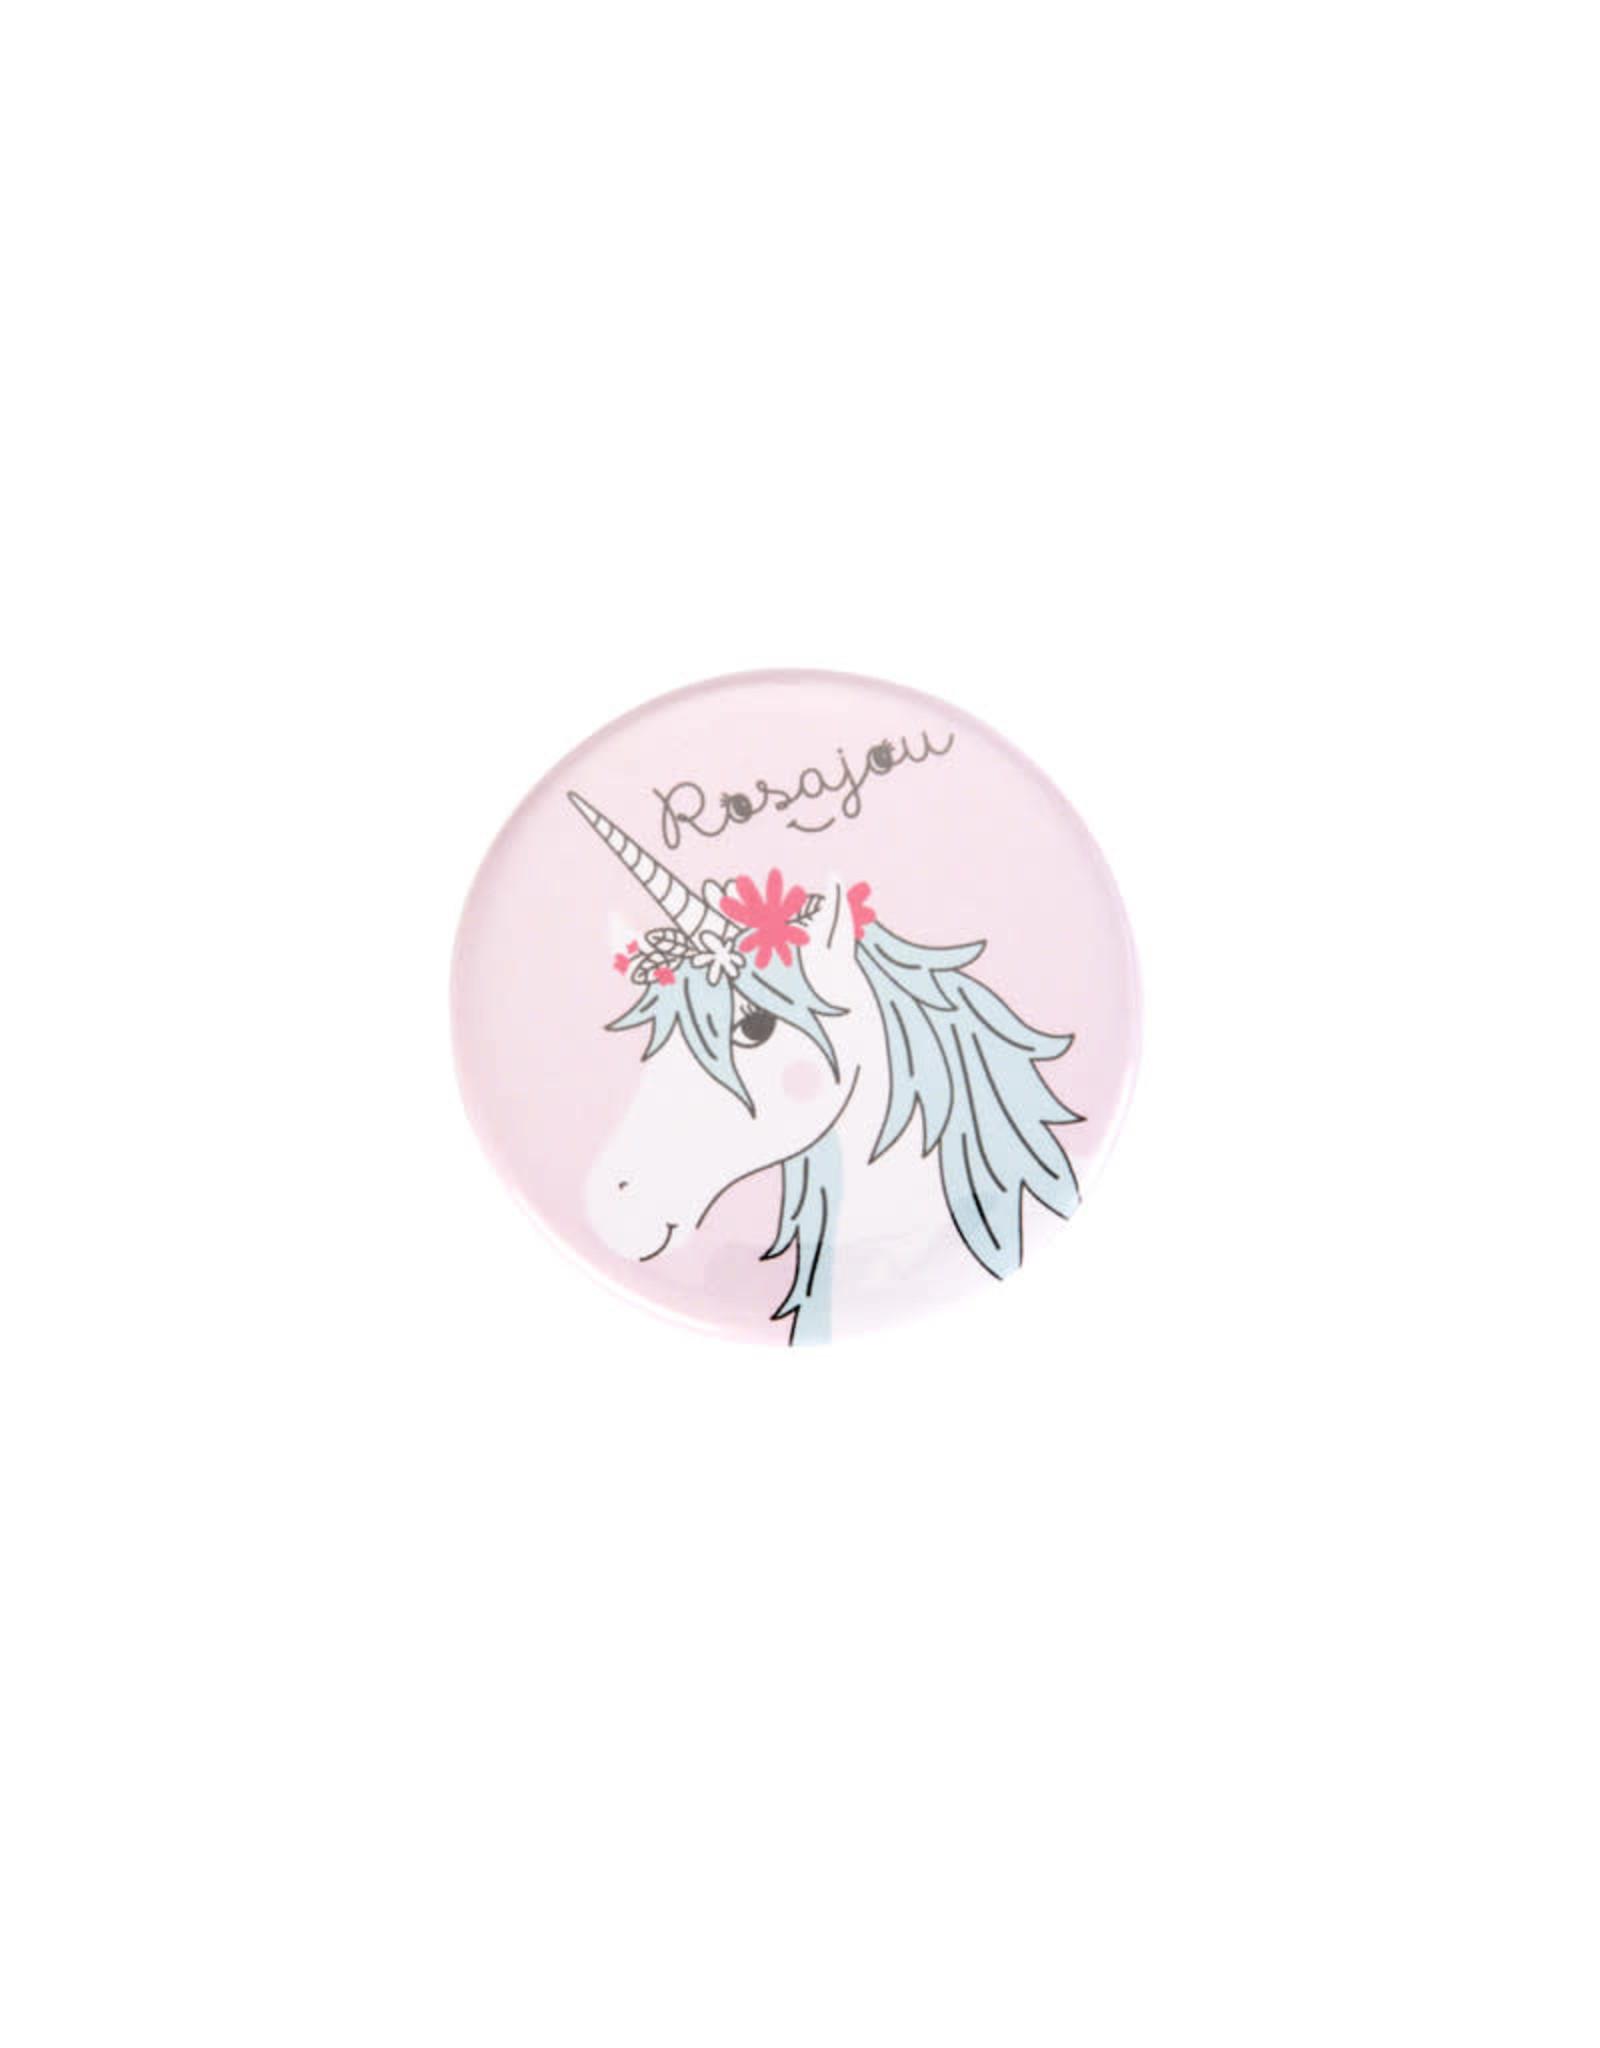 Rosajou Pocket mirror - Unicorn